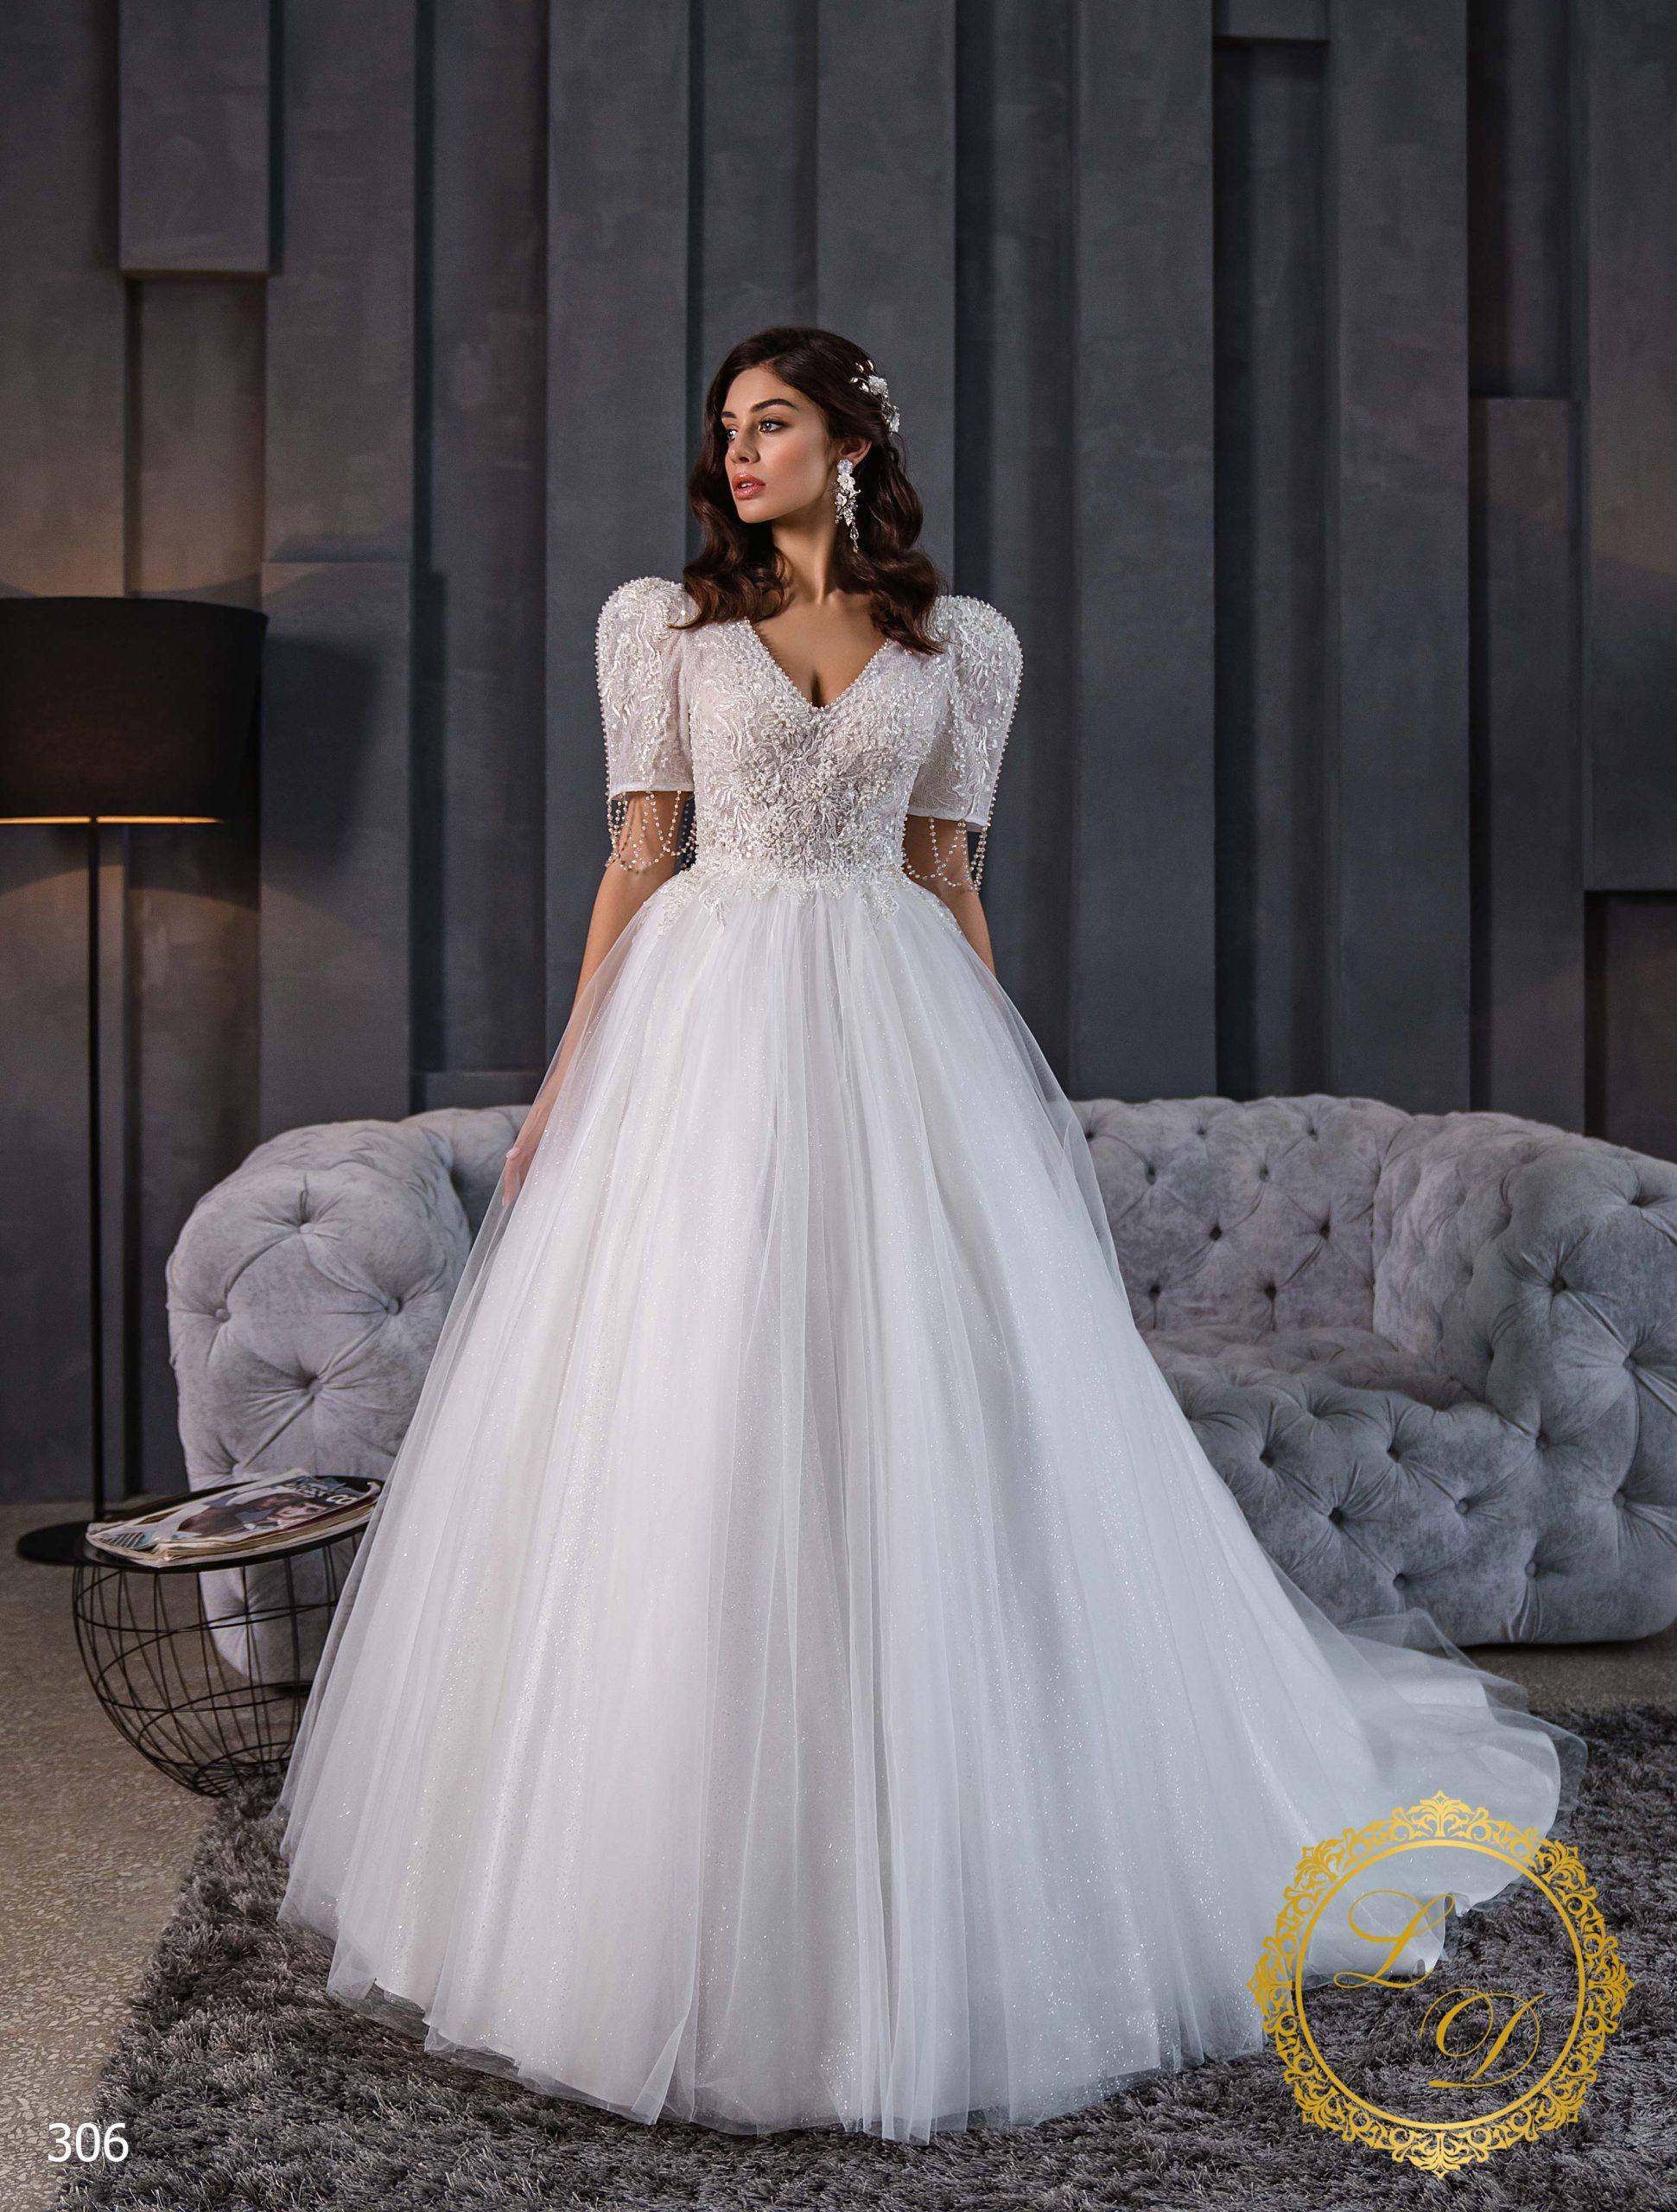 Wedding Dress Lady Di 306-1